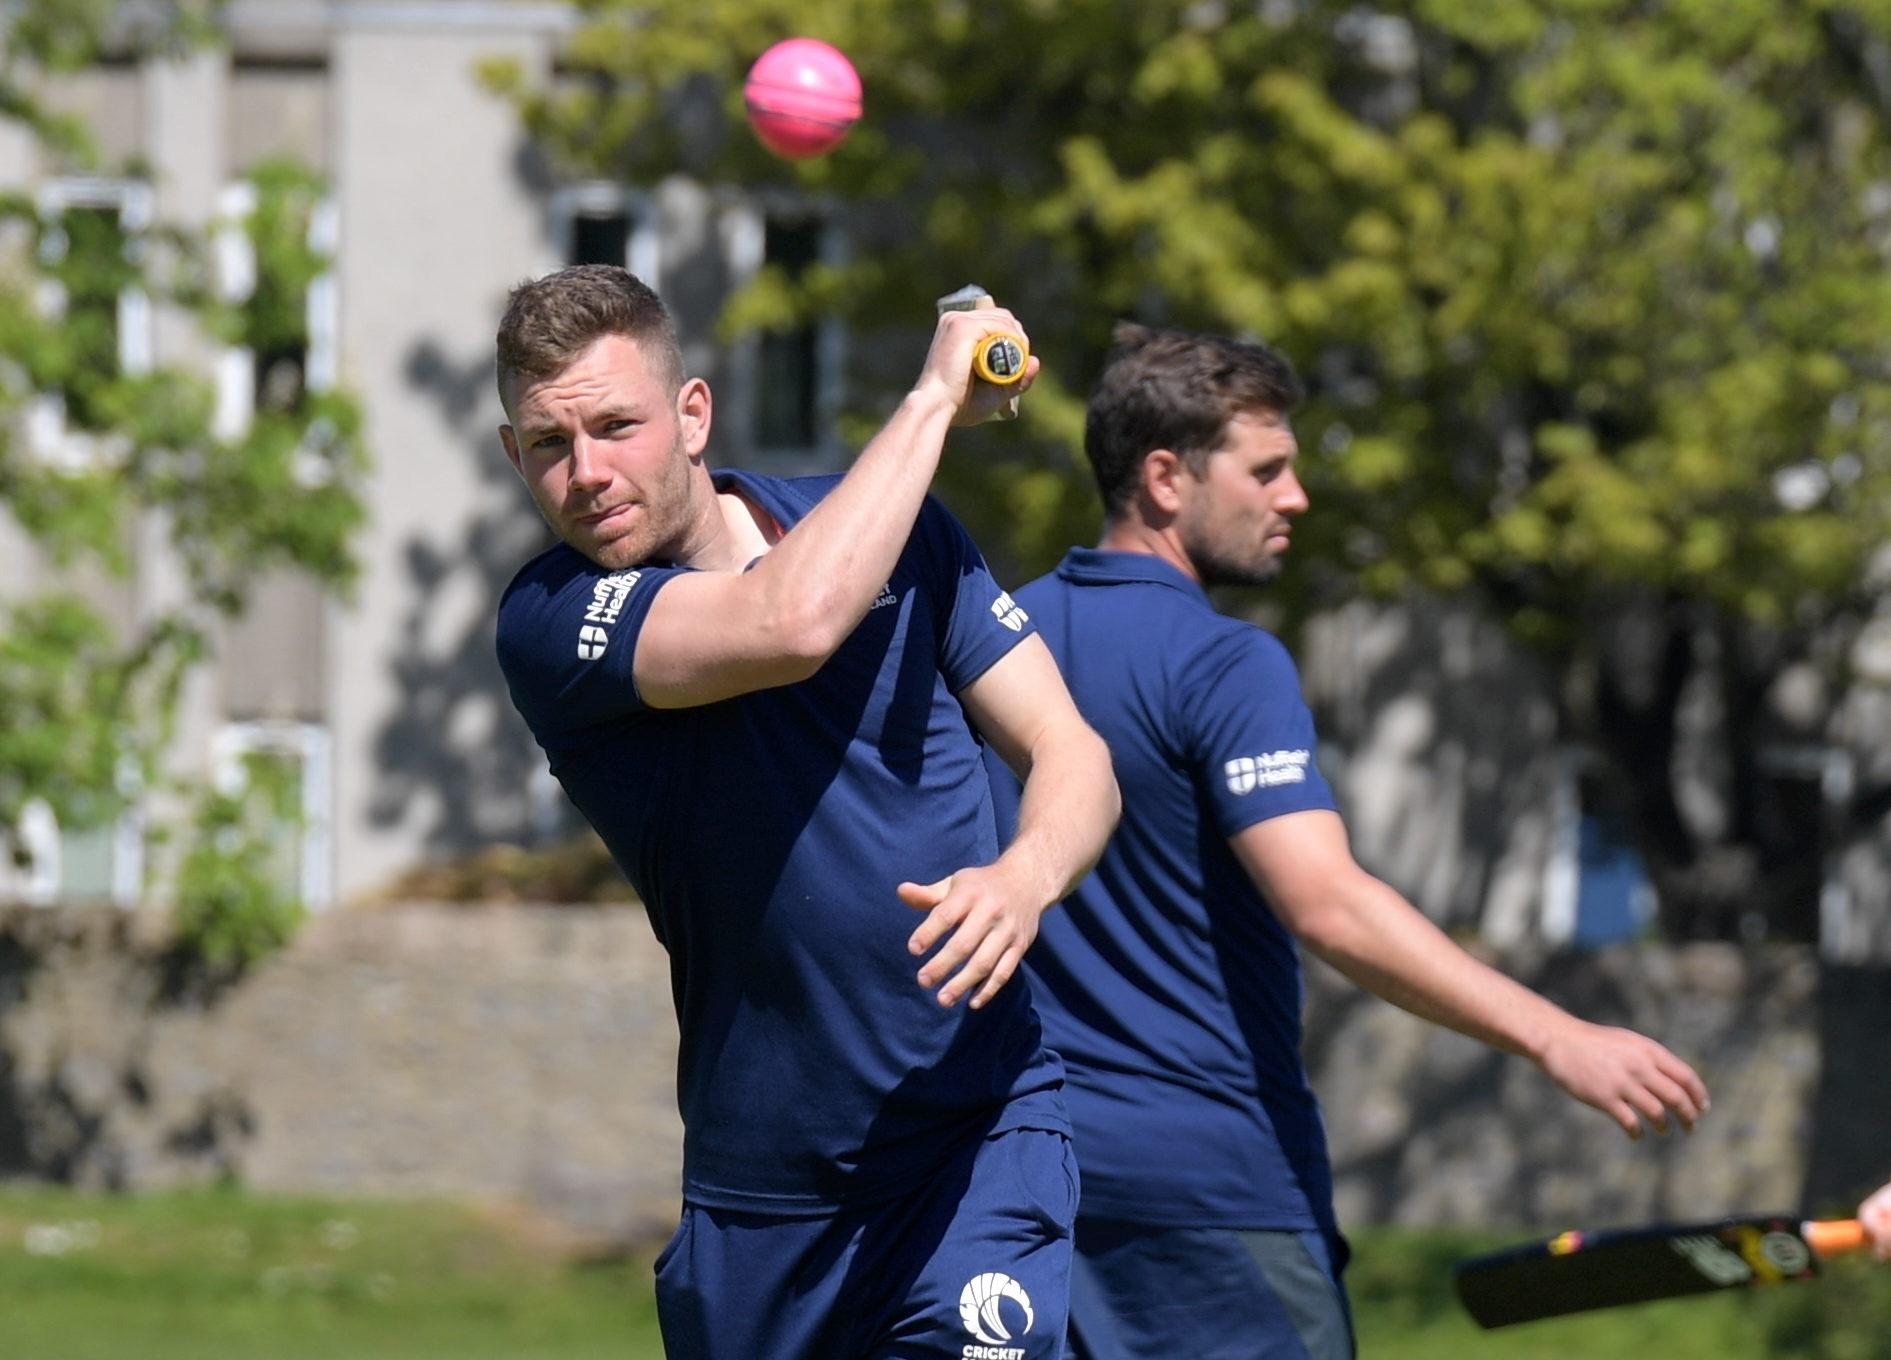 Aberdeen-born Scotland wicket-keeper Matthew Cross.